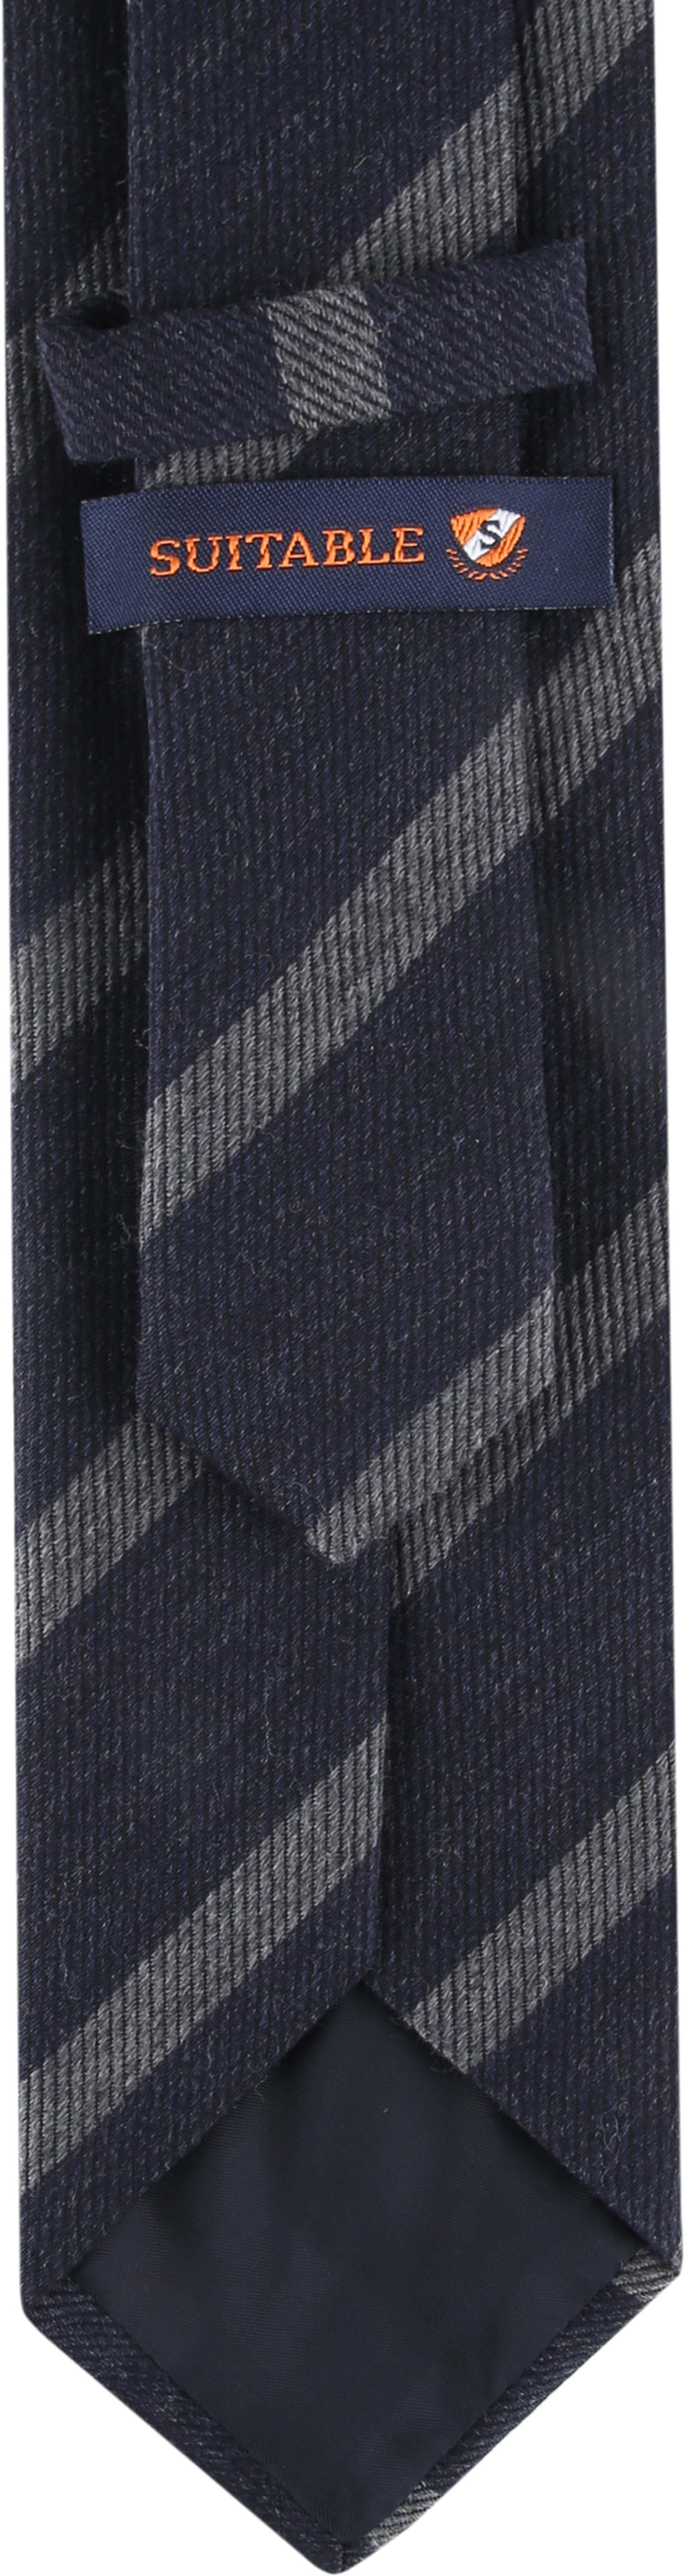 Suitable Krawatte Streifen Dunkelgrau Foto 2